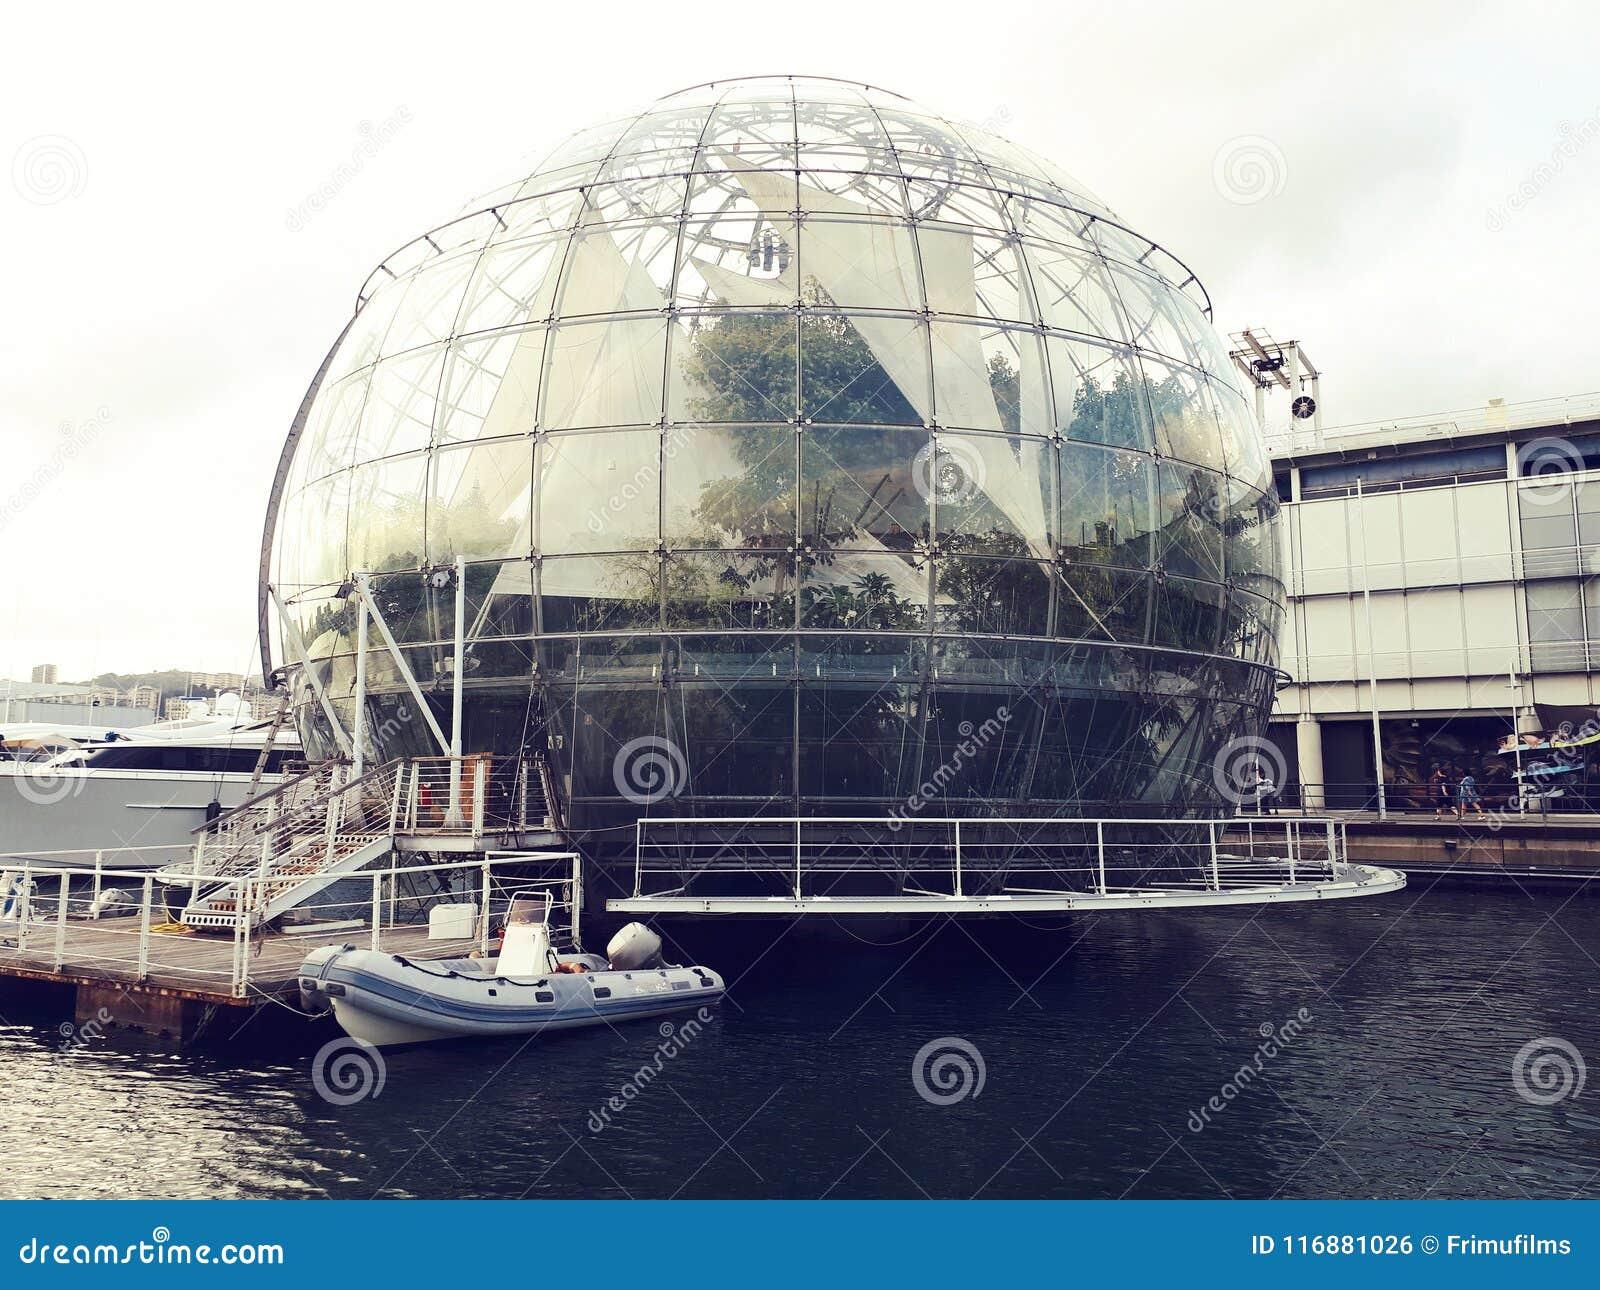 Biosfera dome in genoa is a giant glass ball